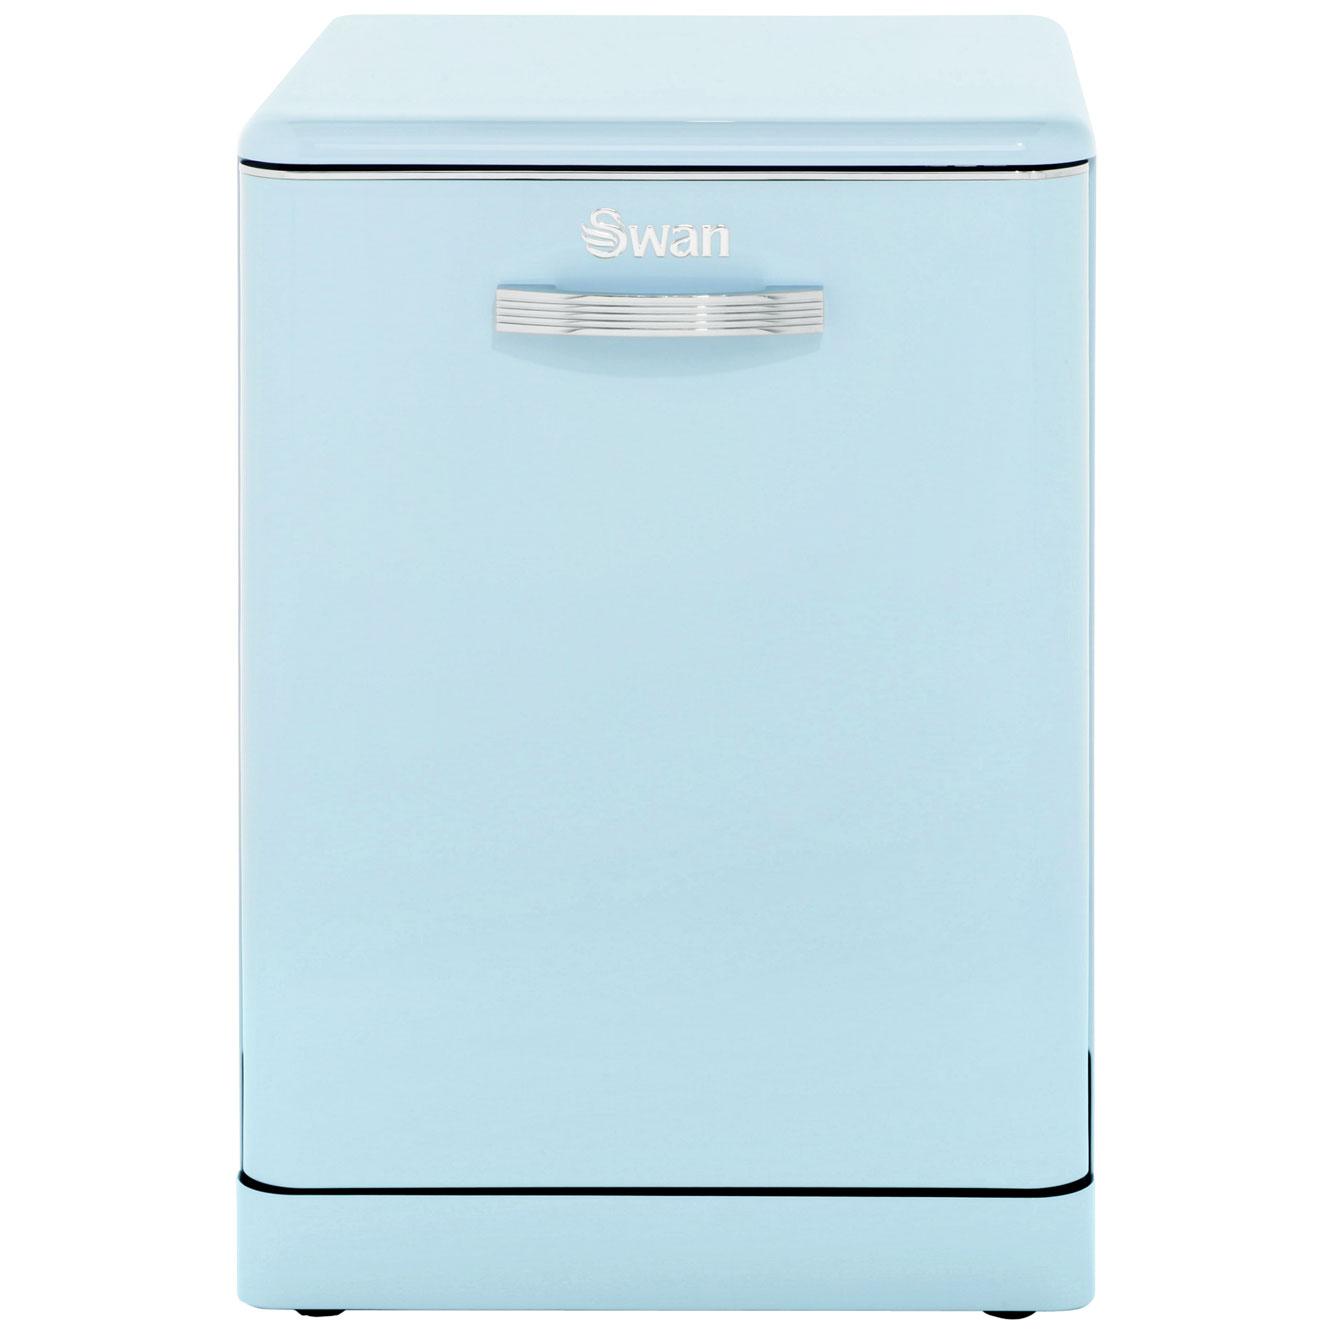 SDW7040BLN_BL | Swan dishwasher | Blue | A+ rating | ao.com